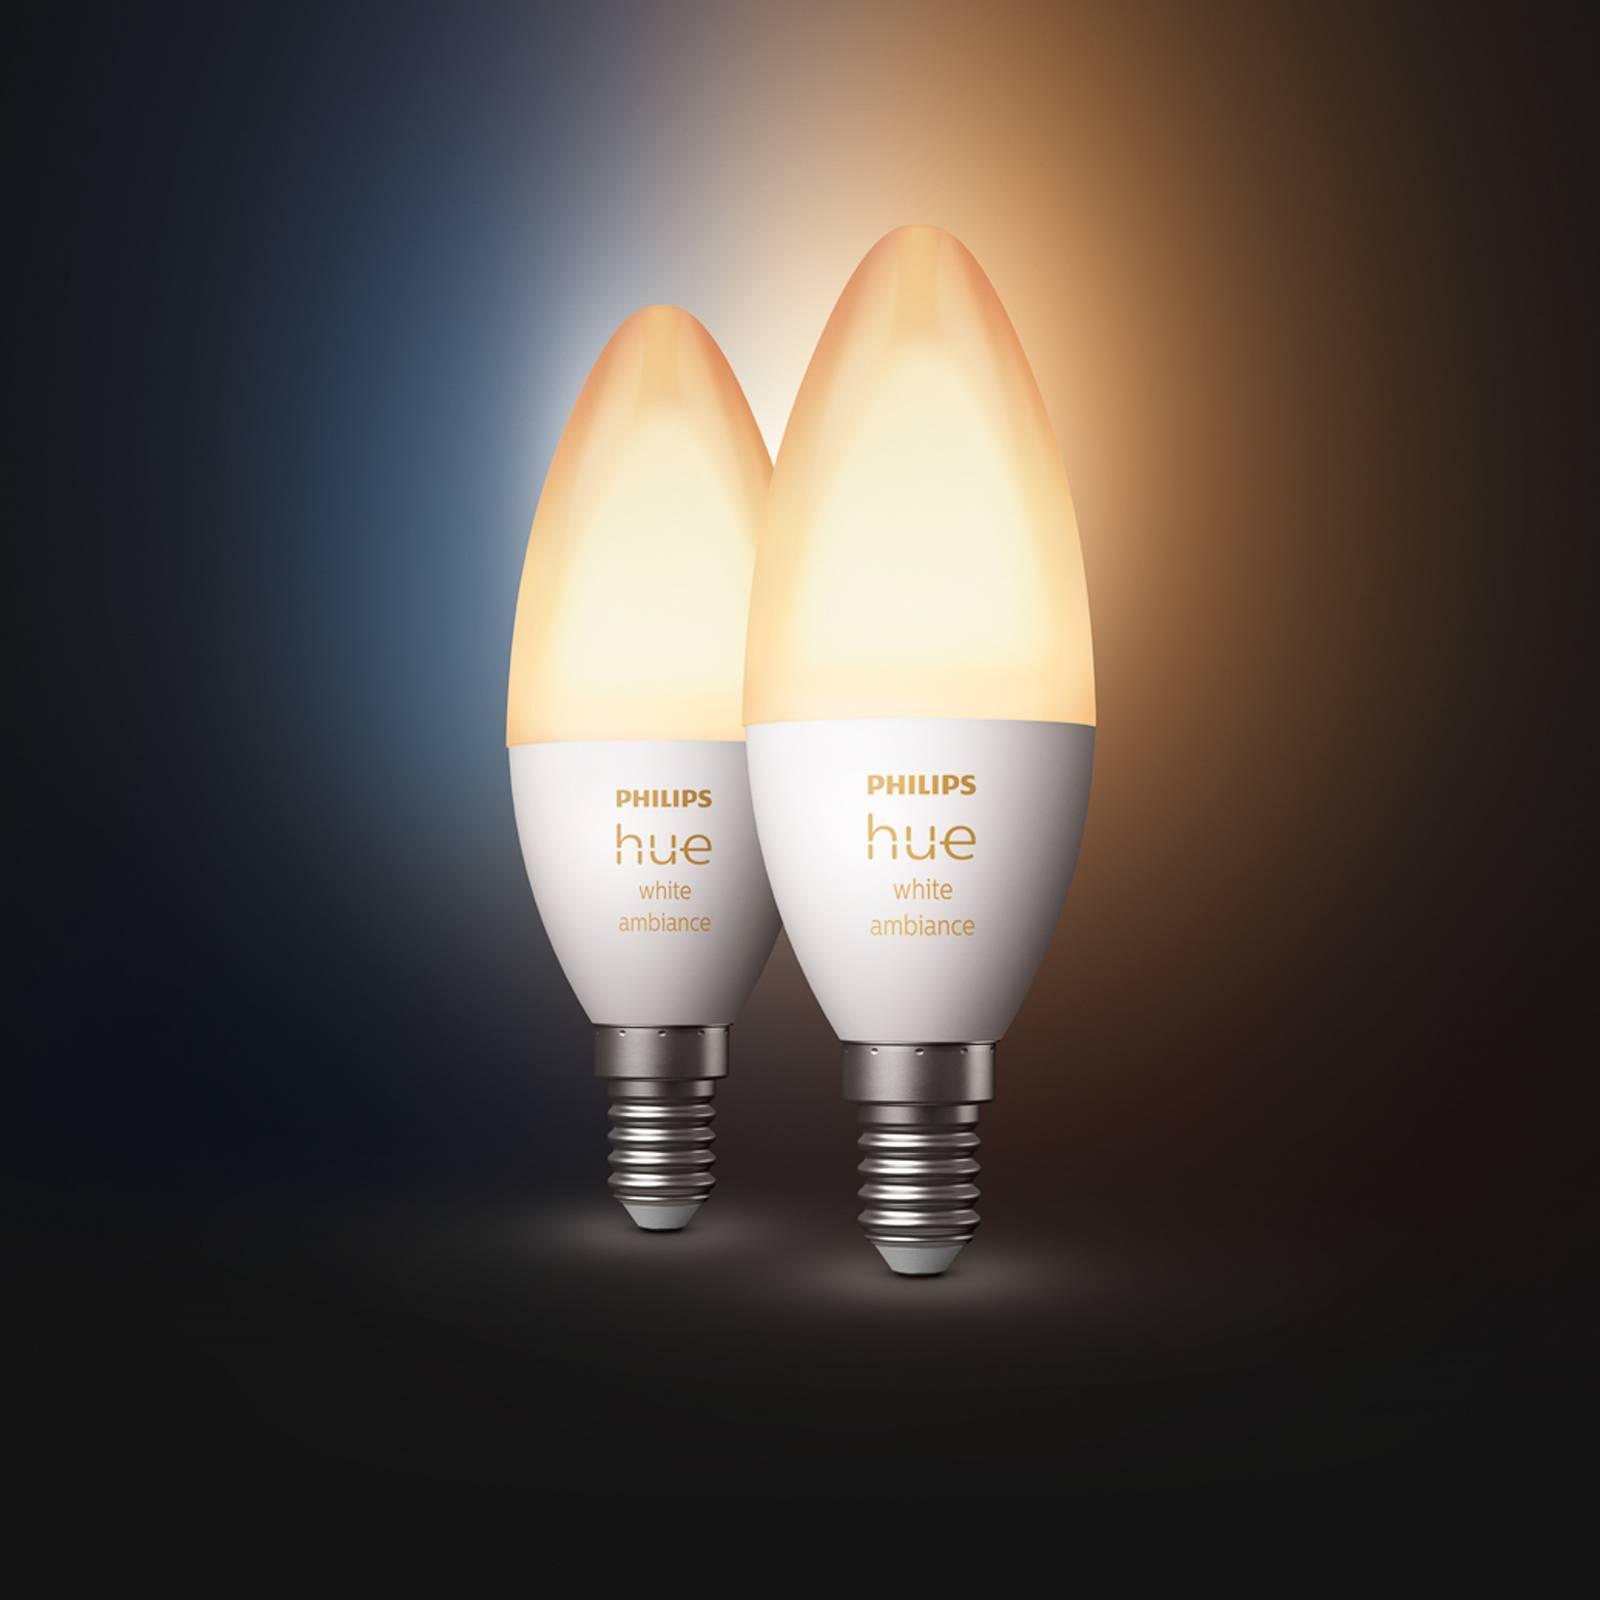 Philips Hue kynttilälamppu White Ambiance 2x E14